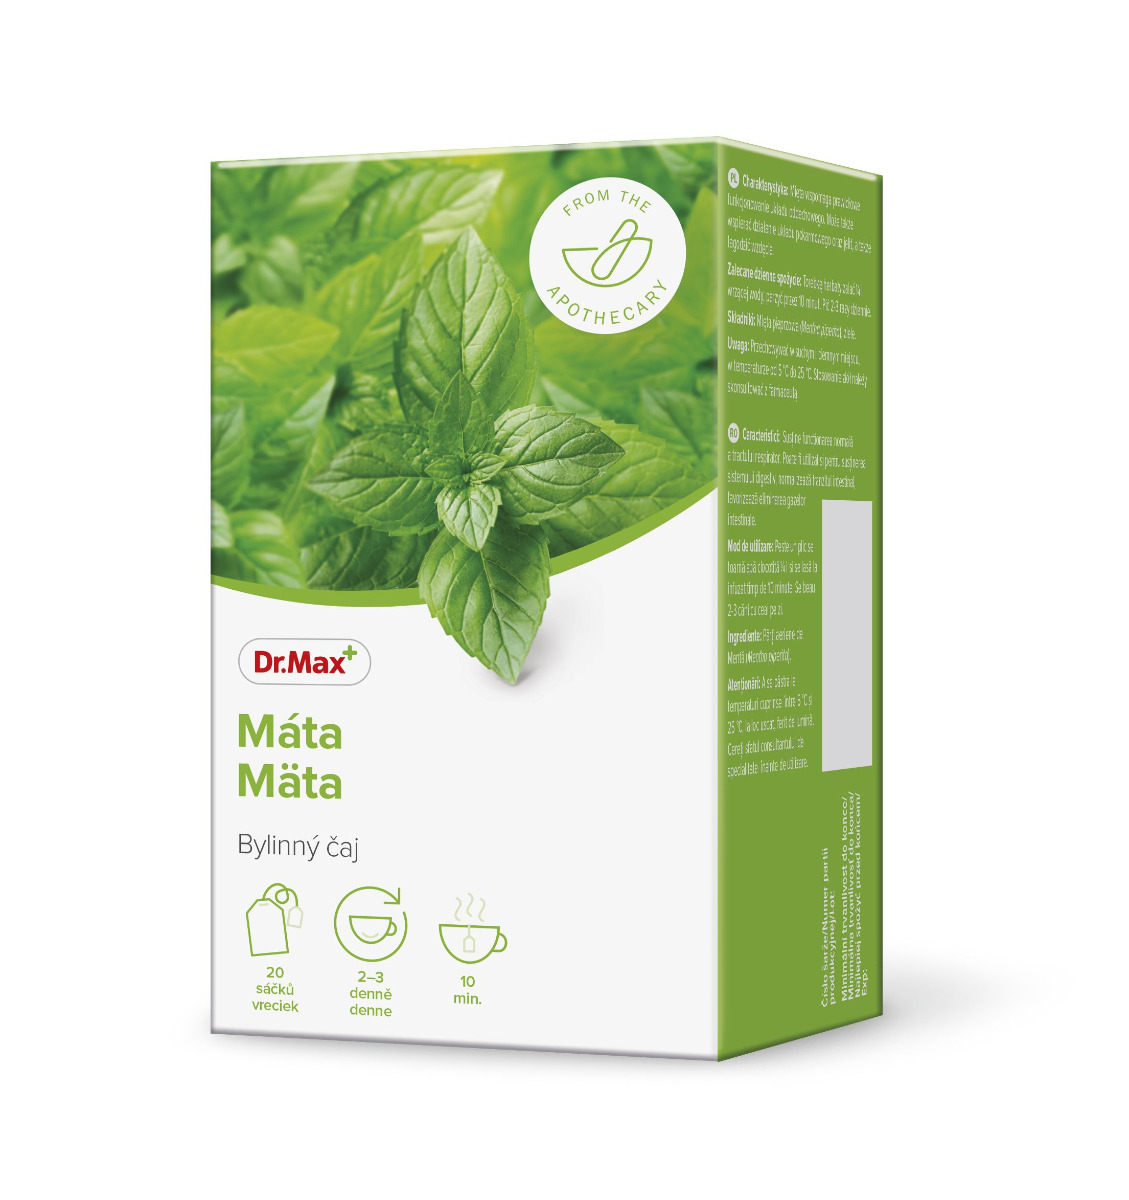 Dr.Max Máta bylinný čaj 20x1,5 g